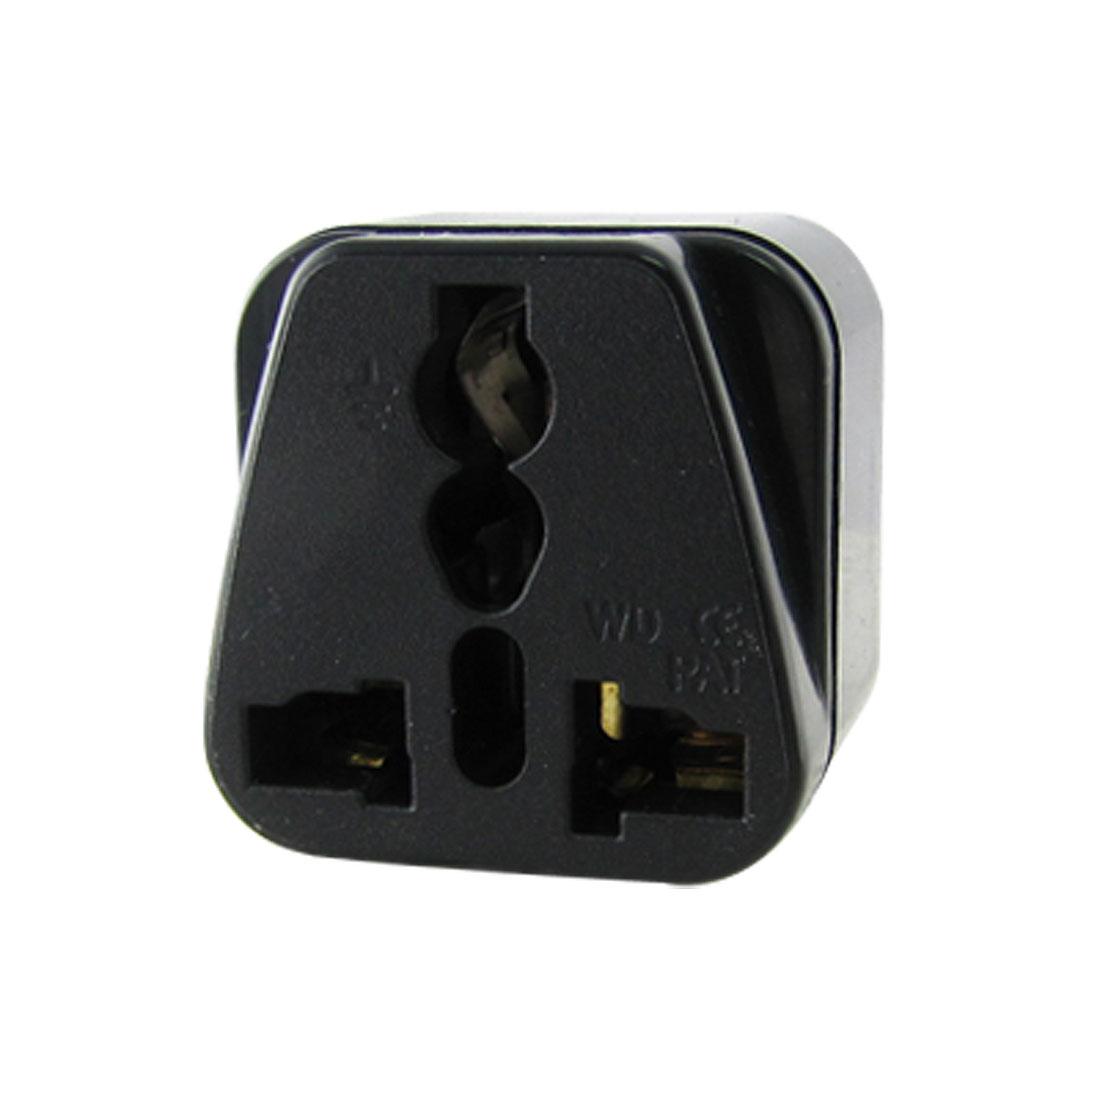 EU Plug to Universal Travel Adapter Converter 250V Black